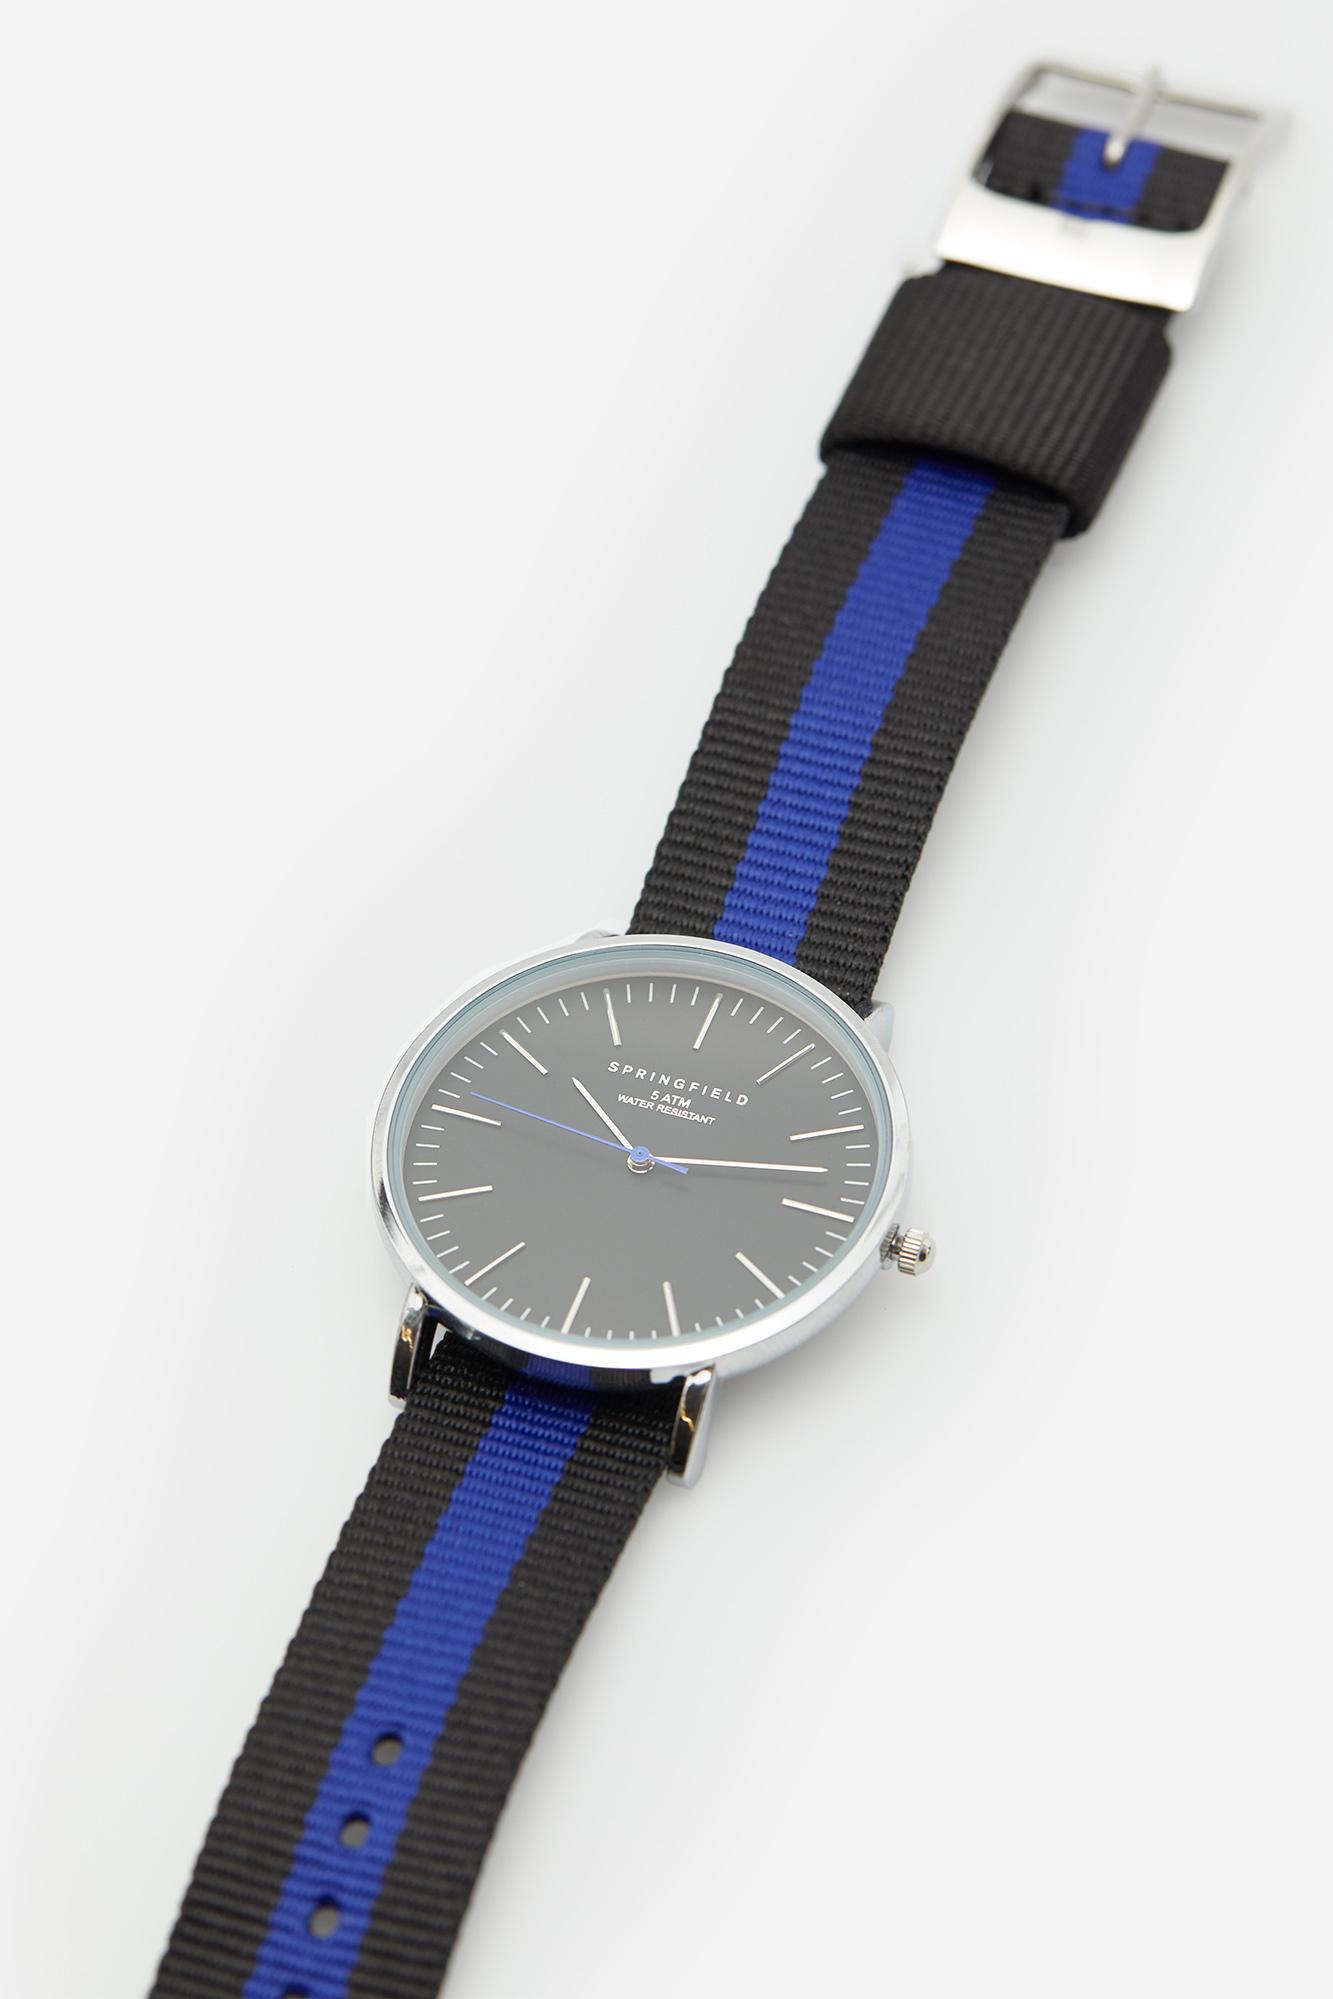 55f8e000c736 Reloj clásico con correa reversible